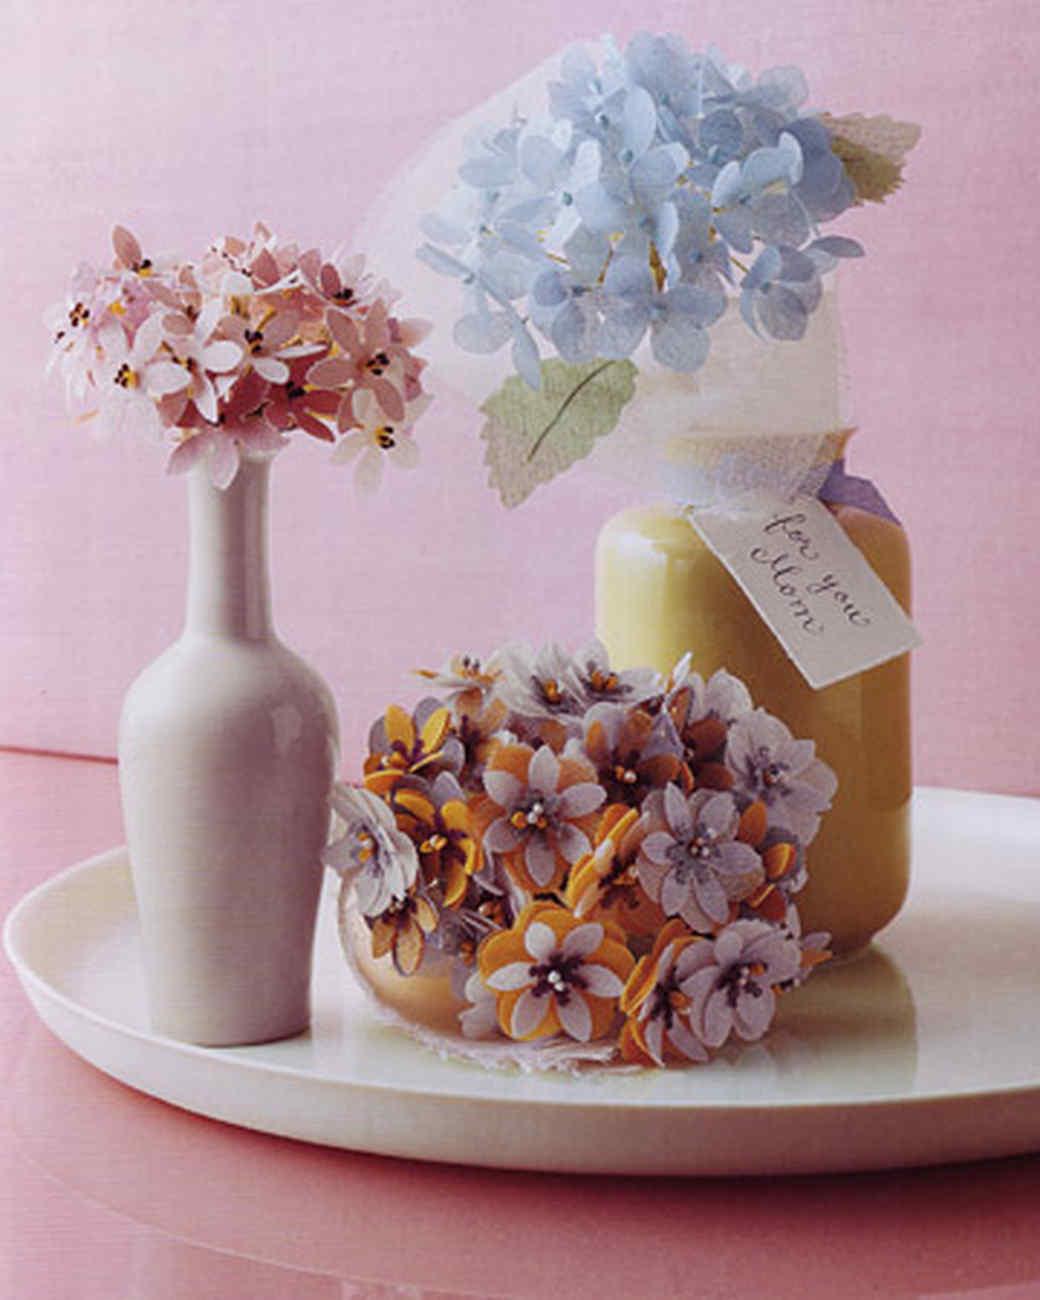 msec_fabric_flowers_invase.jpg